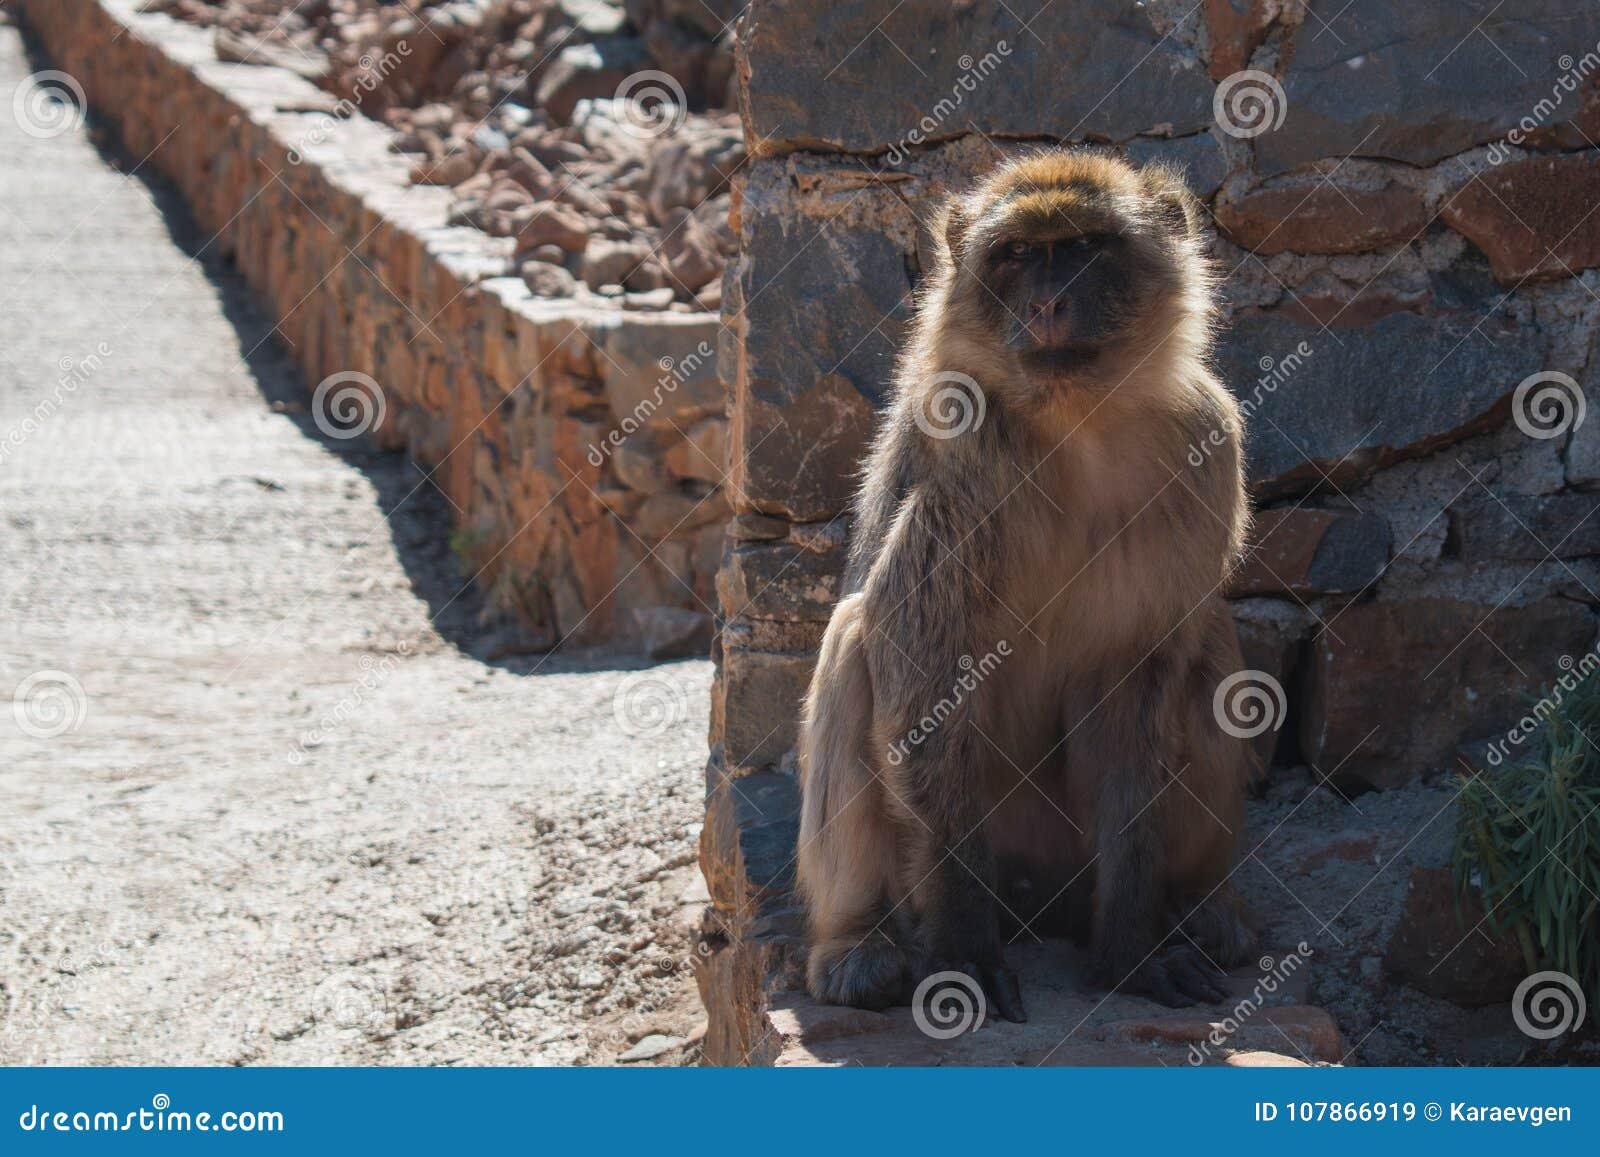 Monkey sits on a ground